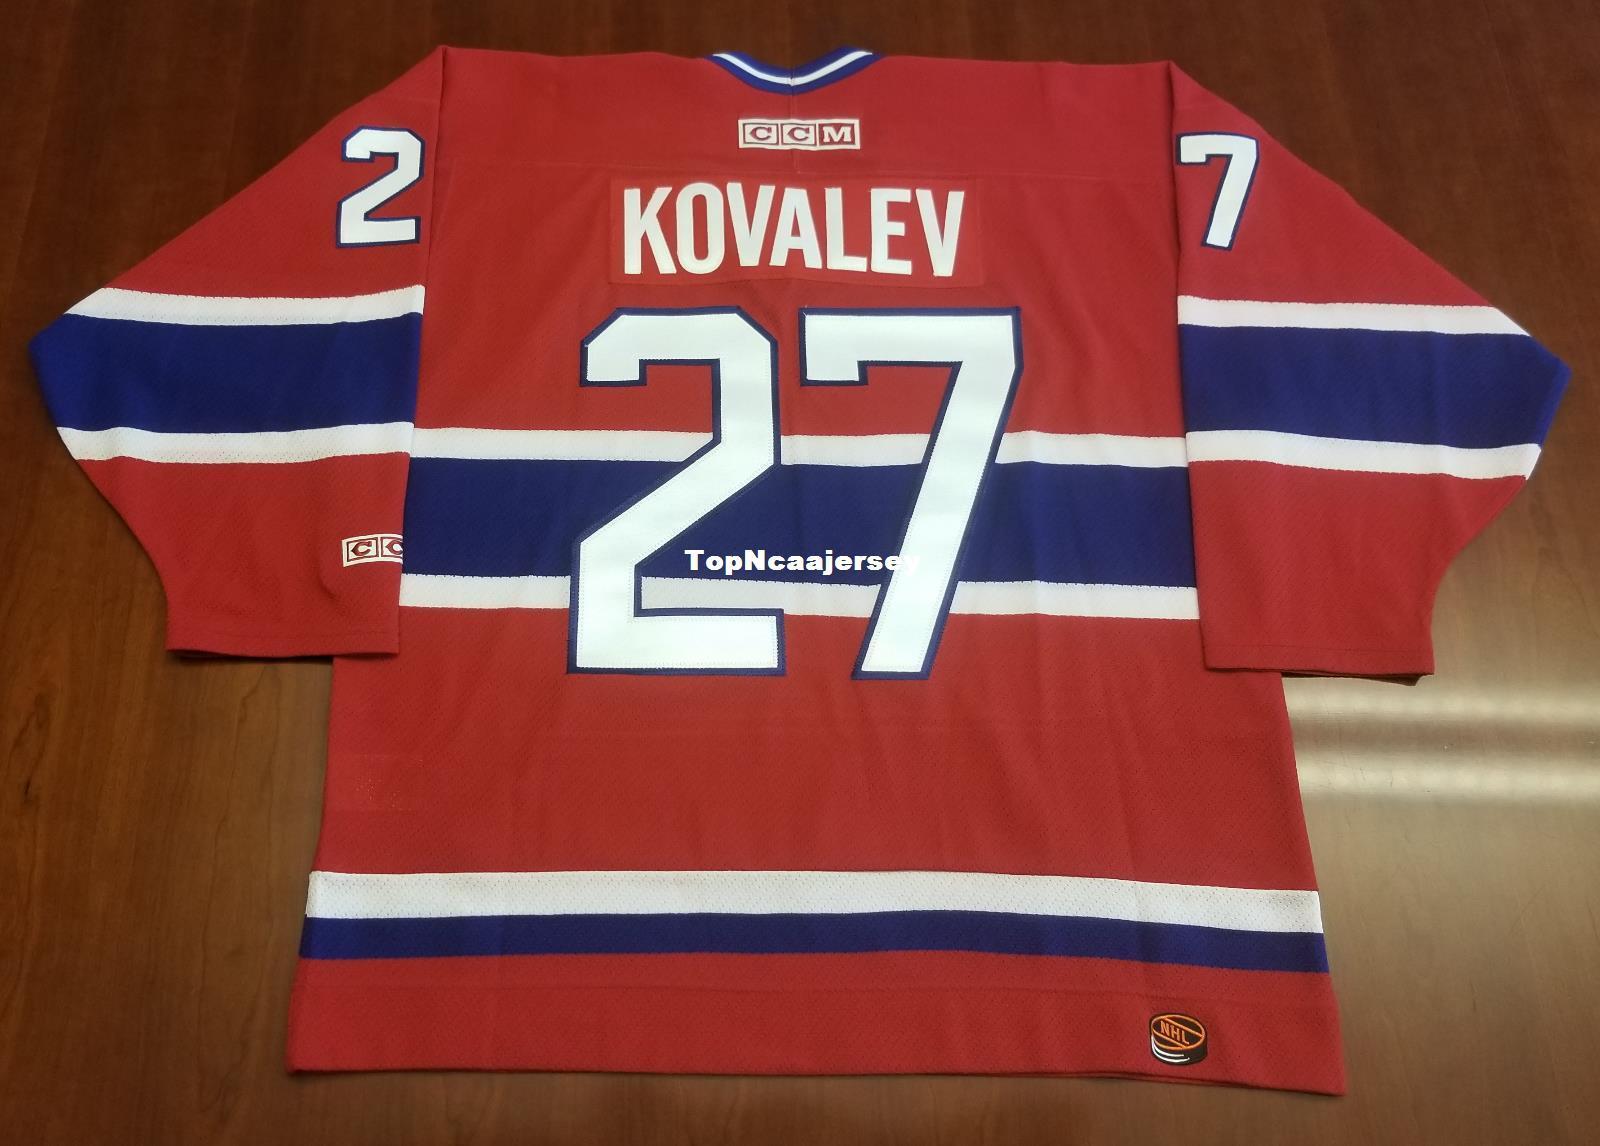 check out e821b 89e63 Wholesale Alex Kovalev Vintage Montreal Canadiens CCM Cheap Hockey Jersey  Red Habs Mens Retro Jerseys